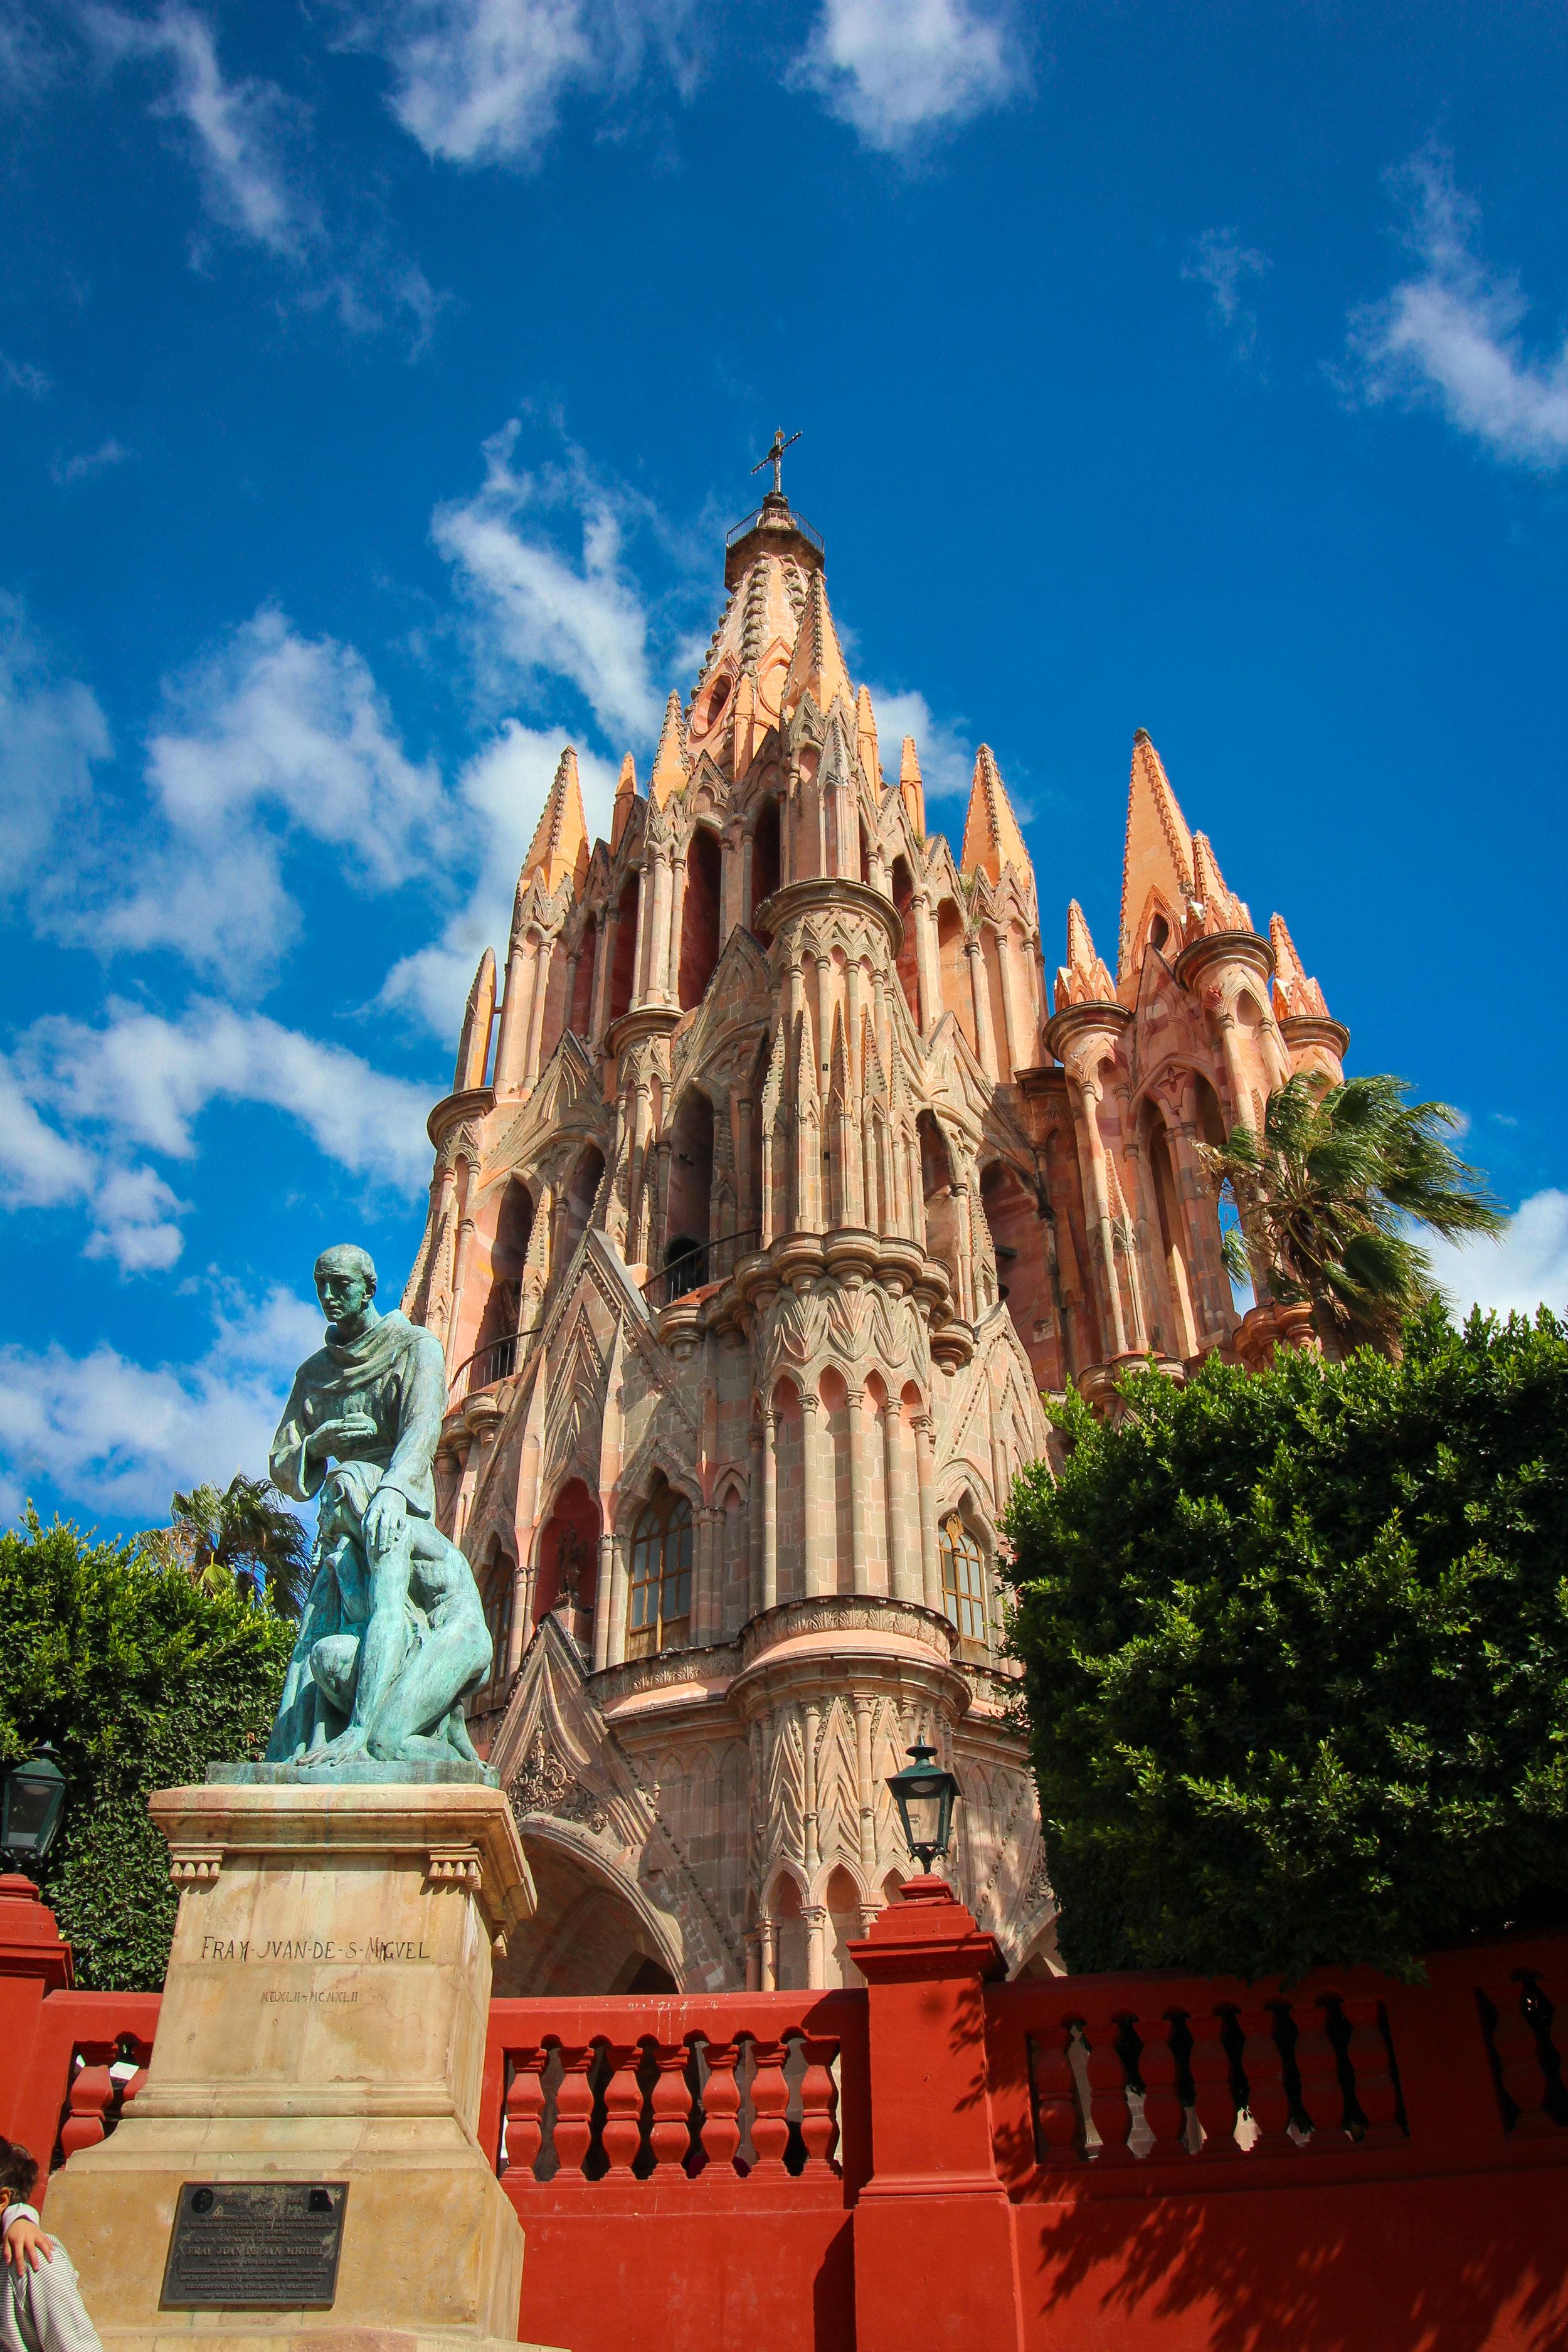 Statue and Church of San Miguel de Allende.